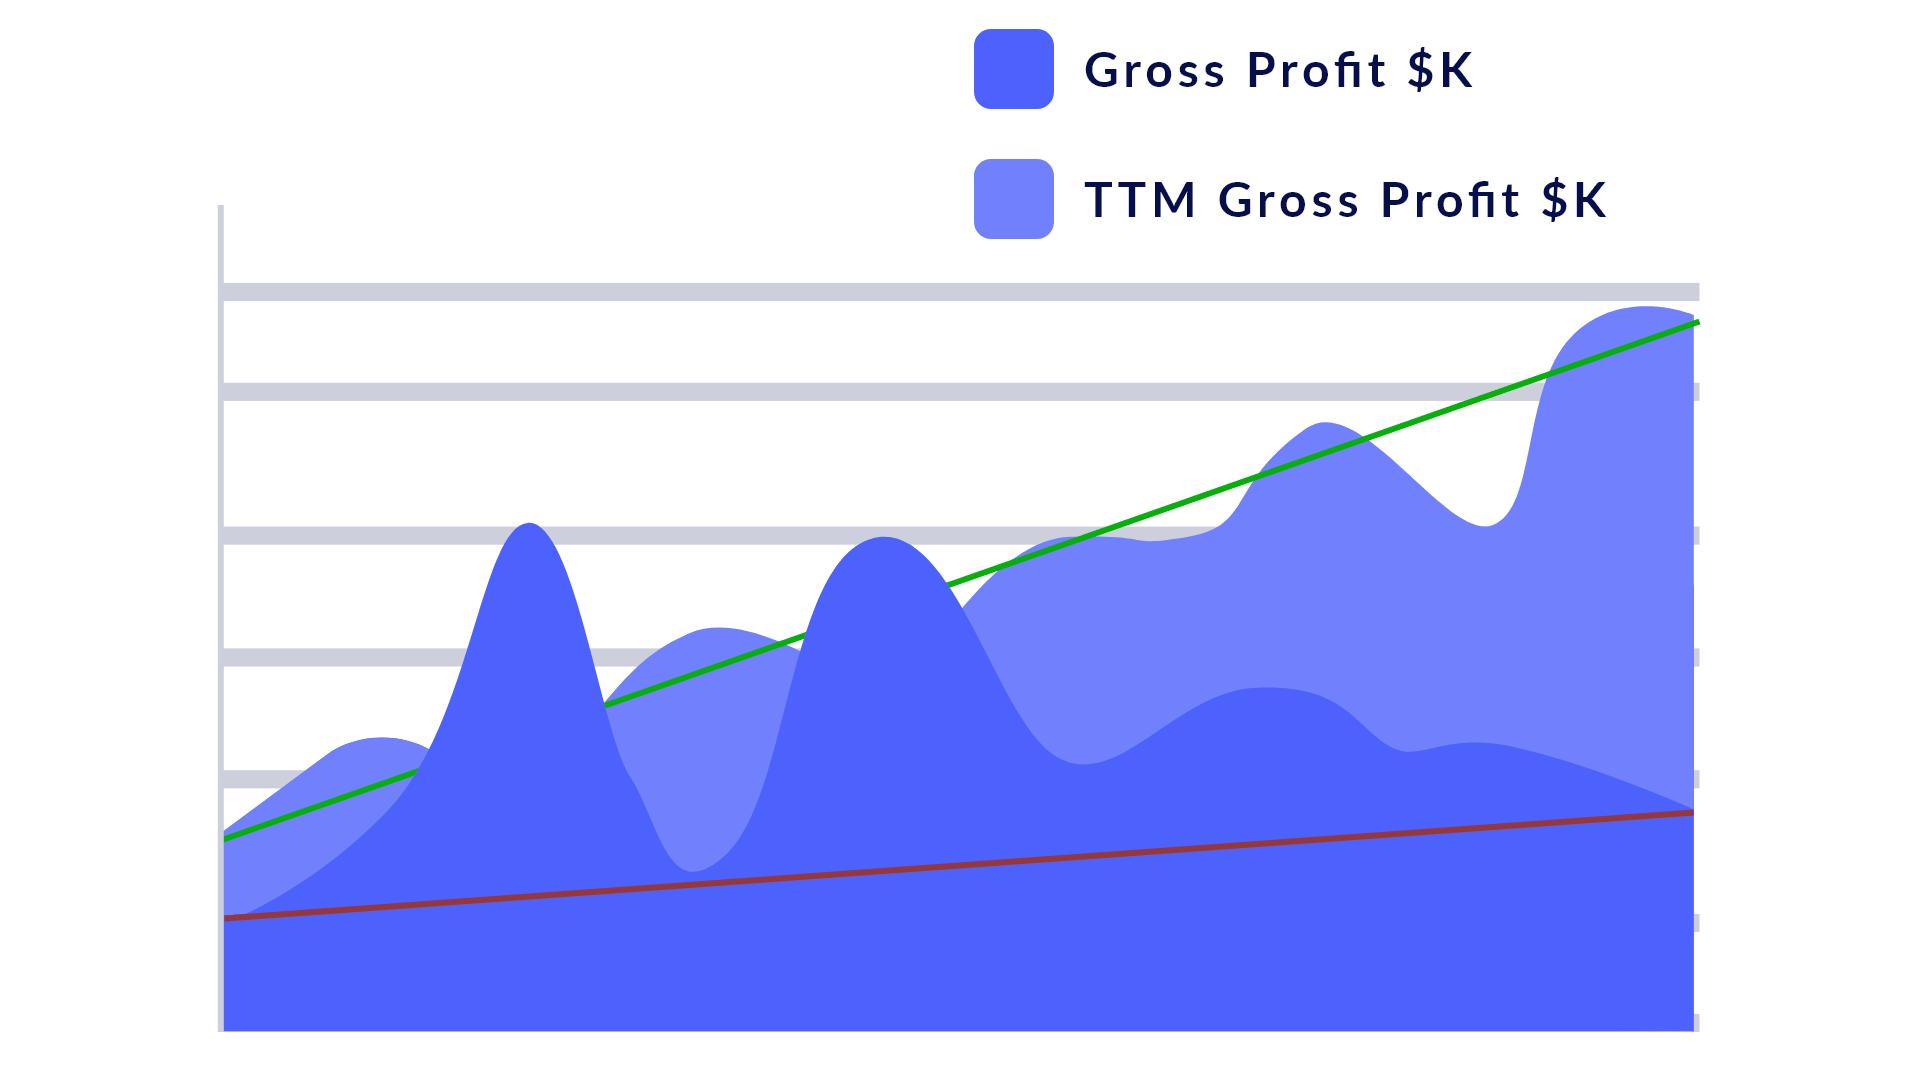 Trailing 12 months representational graph